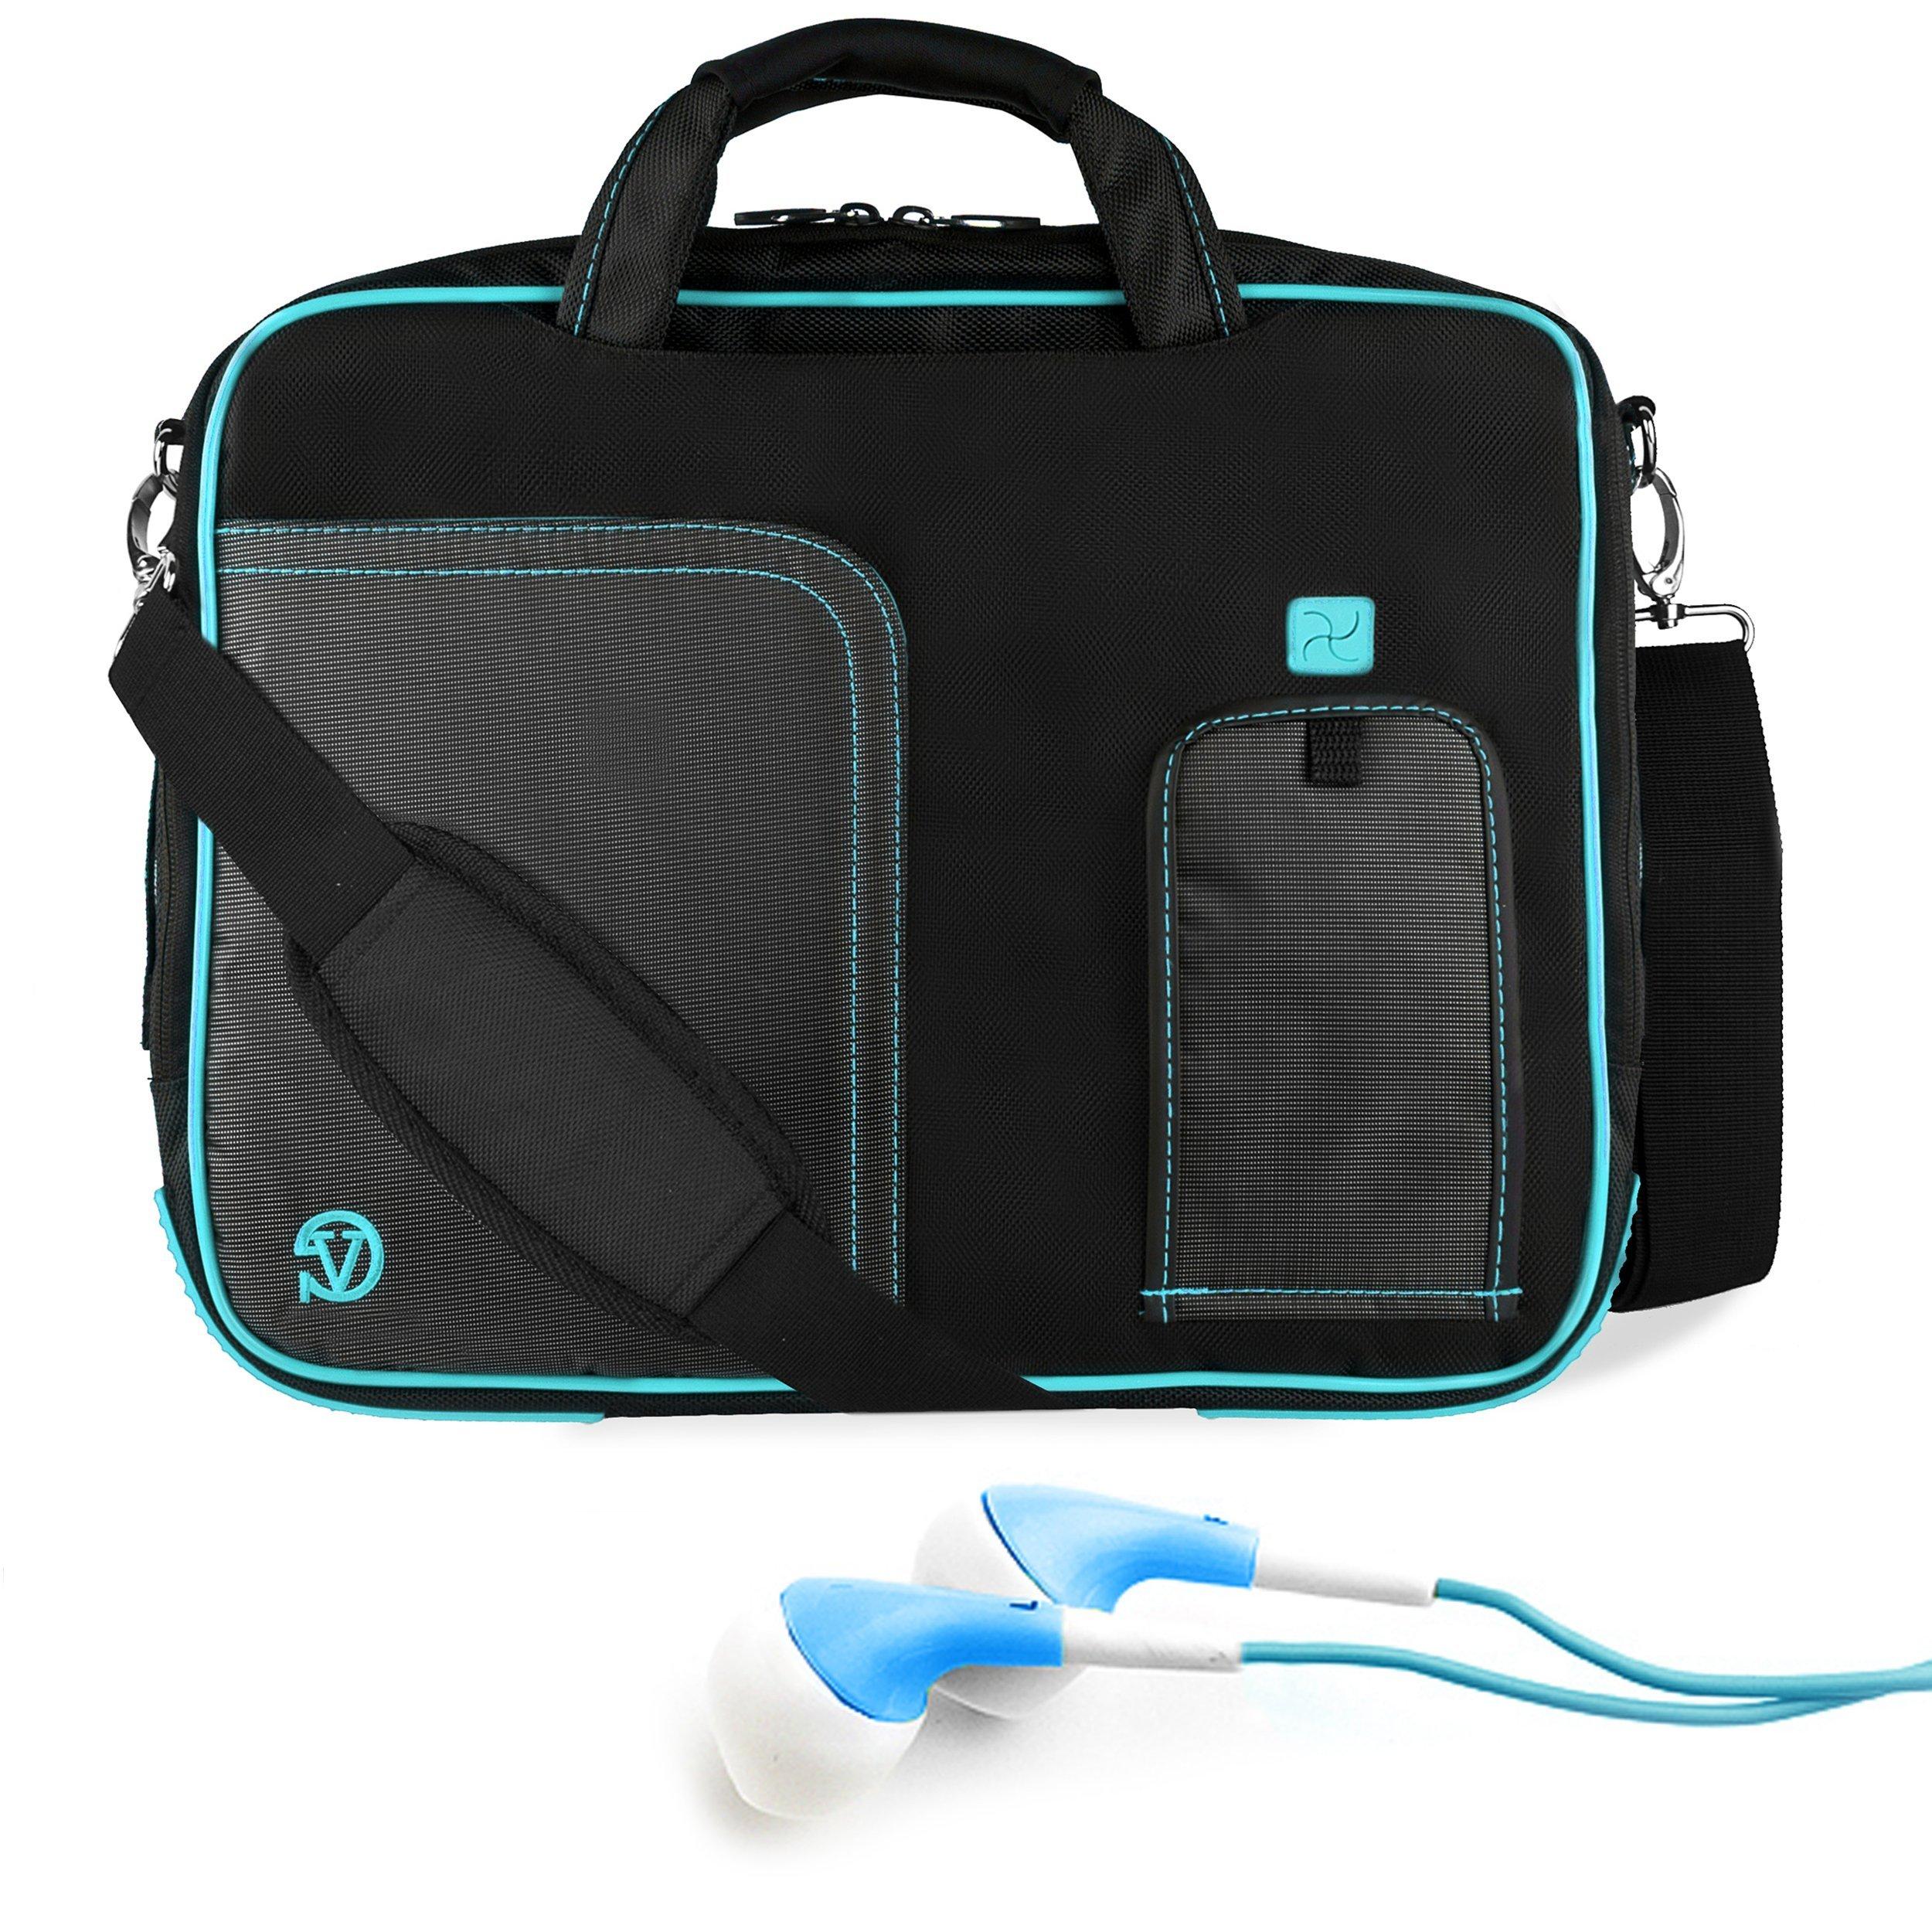 Black Aqua Blue VG Pindar Edition Messenger Bag Carrying Case for Samsung Series 7 XE700T1A 11.6 inch Slate/Business Slate Tablet + Blue Hifi Noise Reducing Headphones